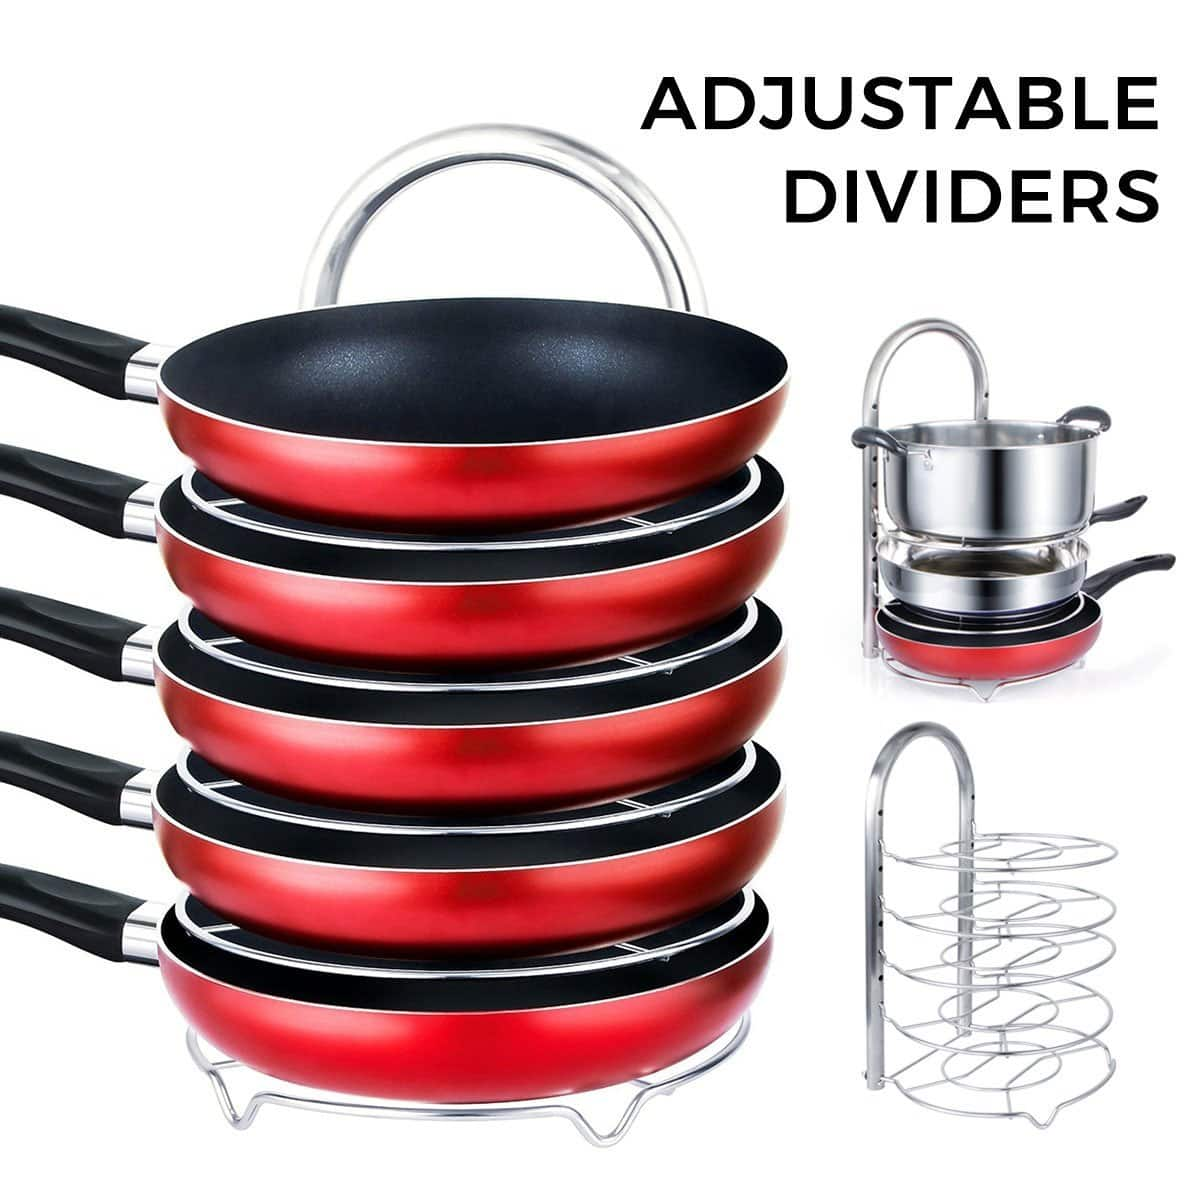 5-Tier Pan & Pot Organizer Rack, Cookware Holder - $17.47 AC - Free Prime Shipping $17.47